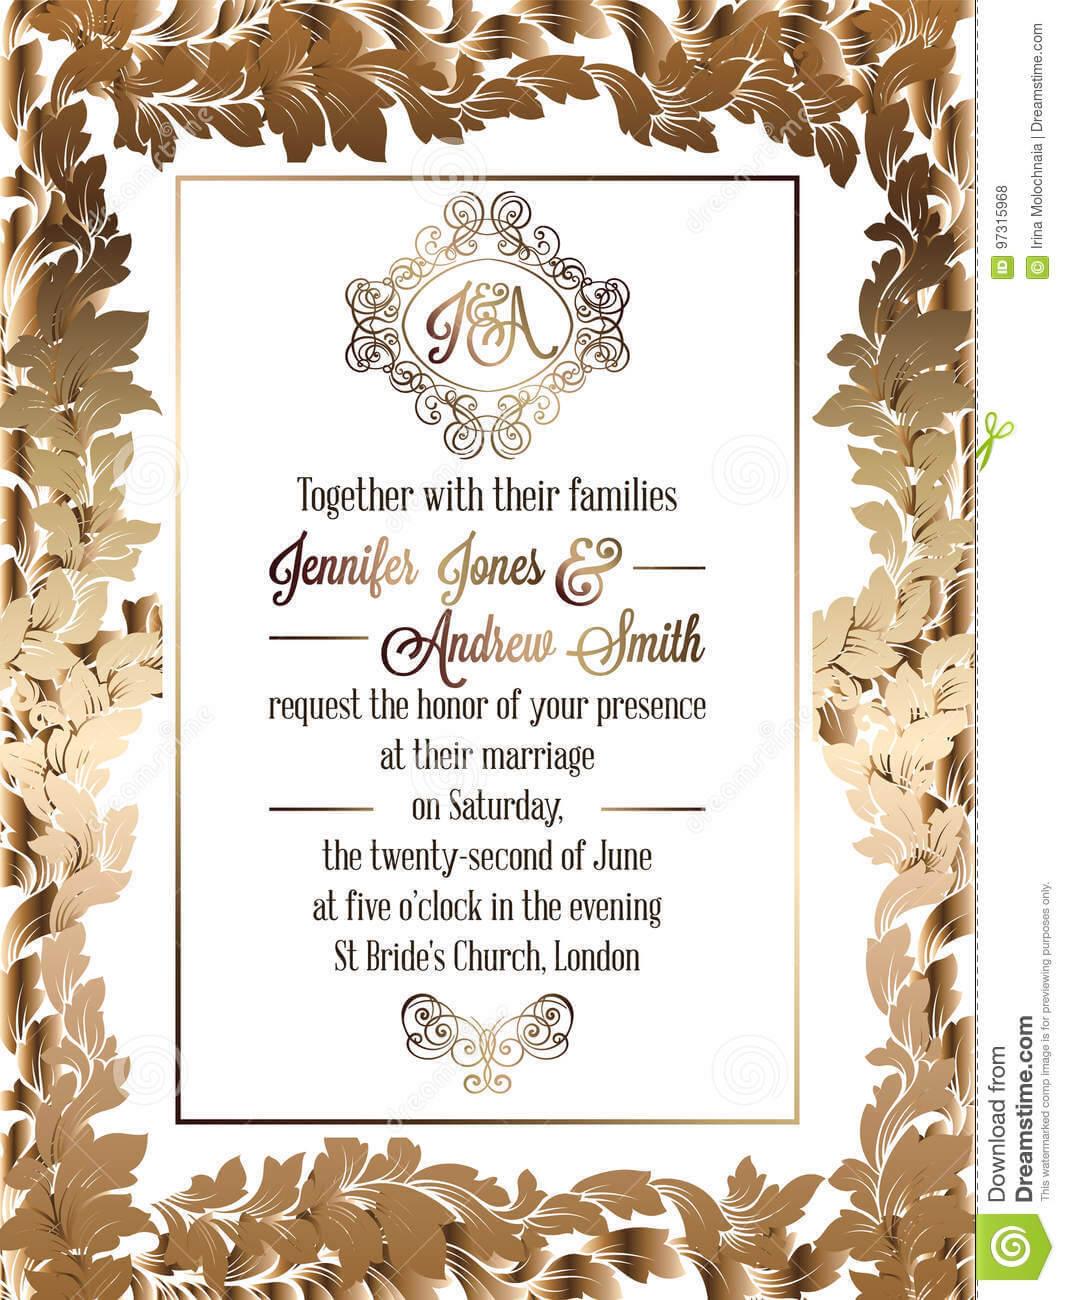 Vintage Baroque Style Wedding Invitation Card Template Inside Church Wedding Invitation Card Template